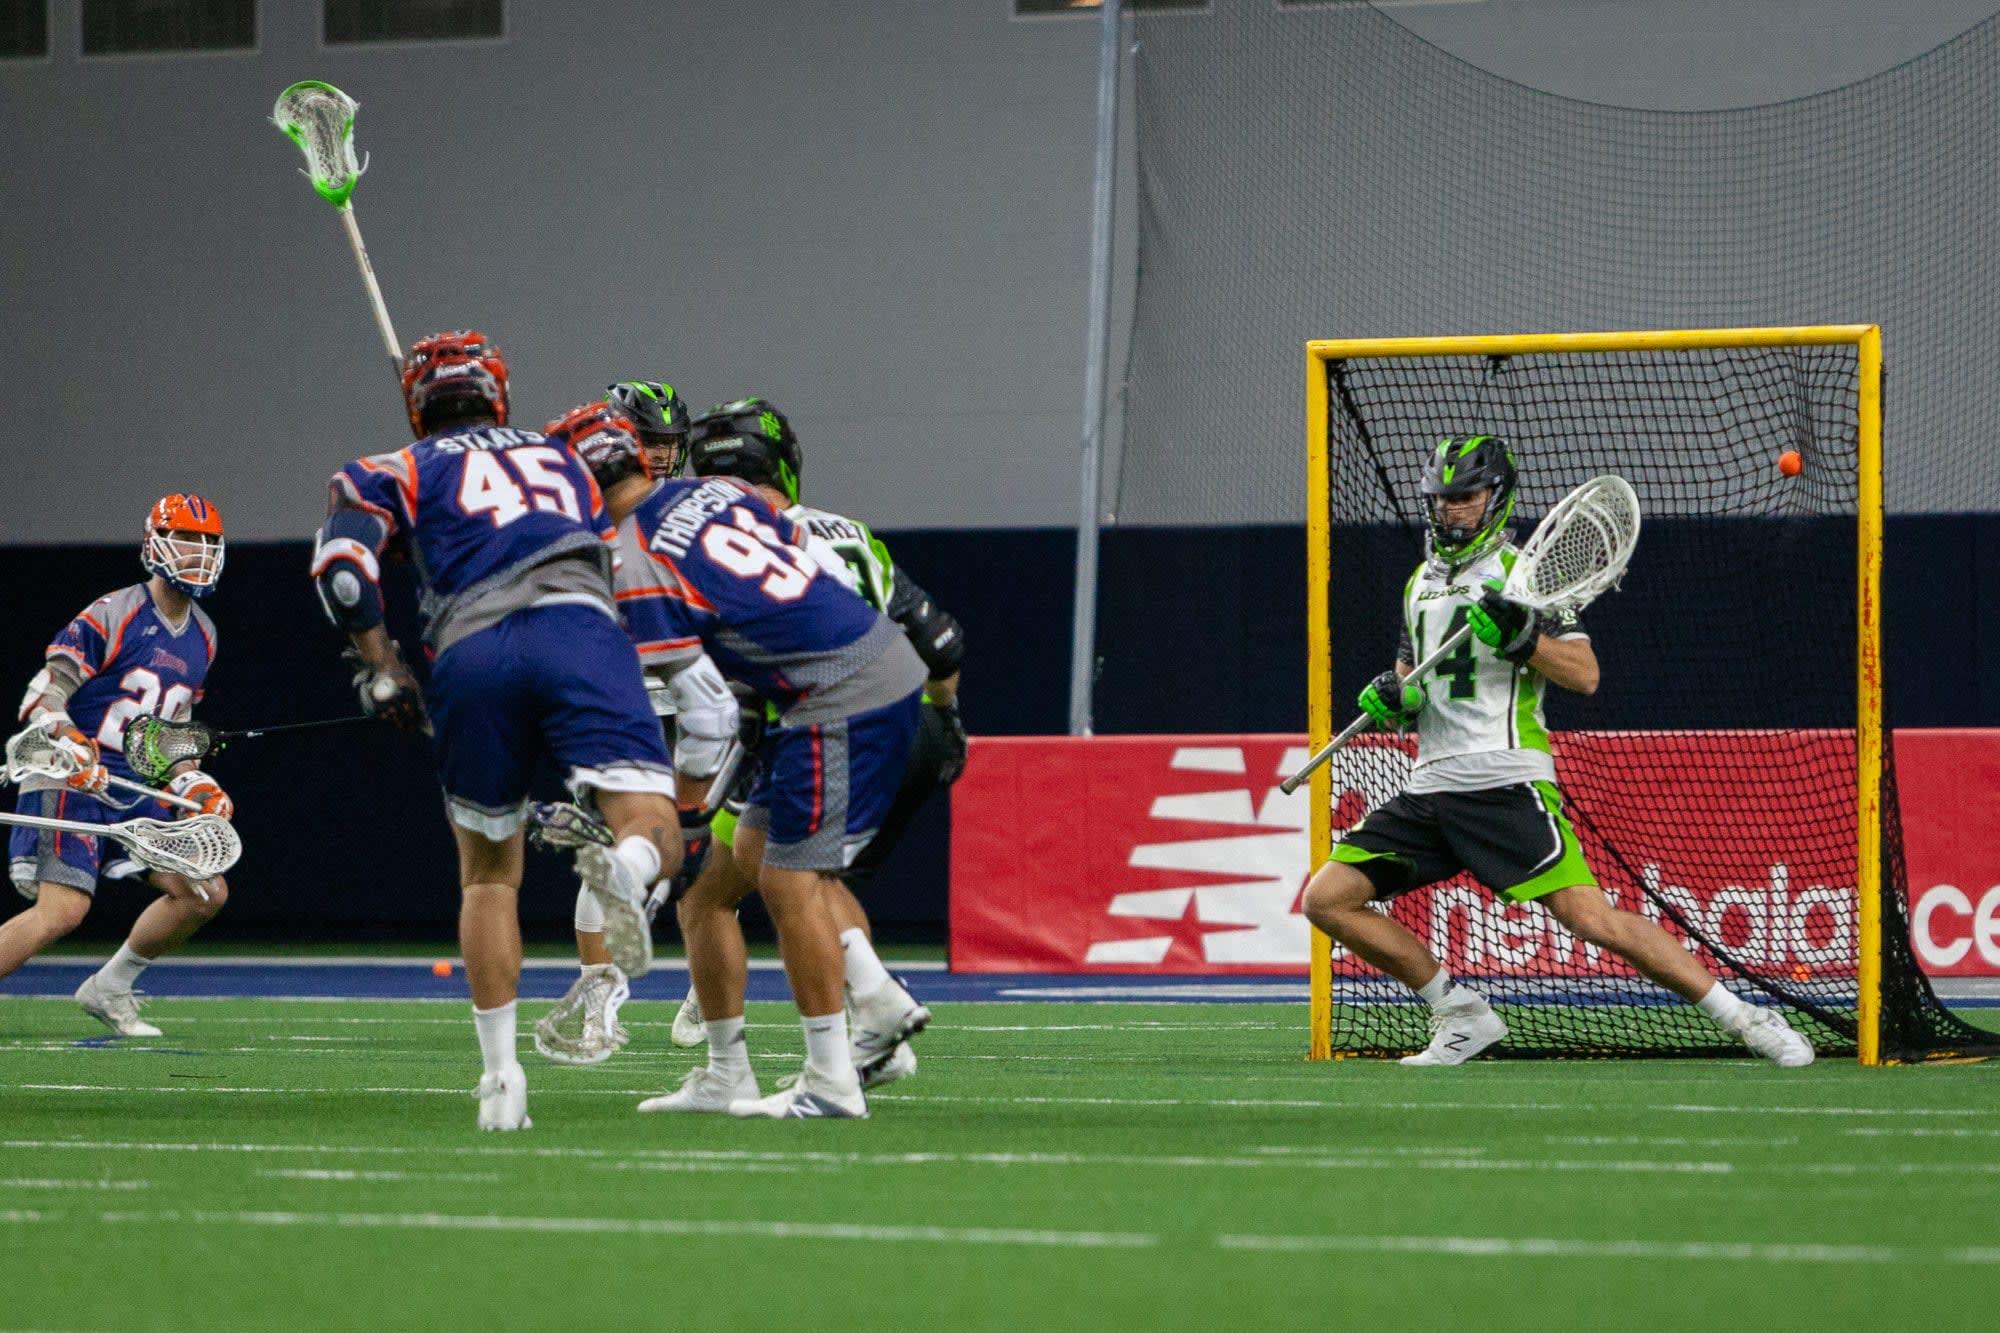 Dallas Rattlers New York Lizards Major League Lacrosse MLL 2018 Photo: Nick Coyne / LaxAllStars.com major league lacrosse